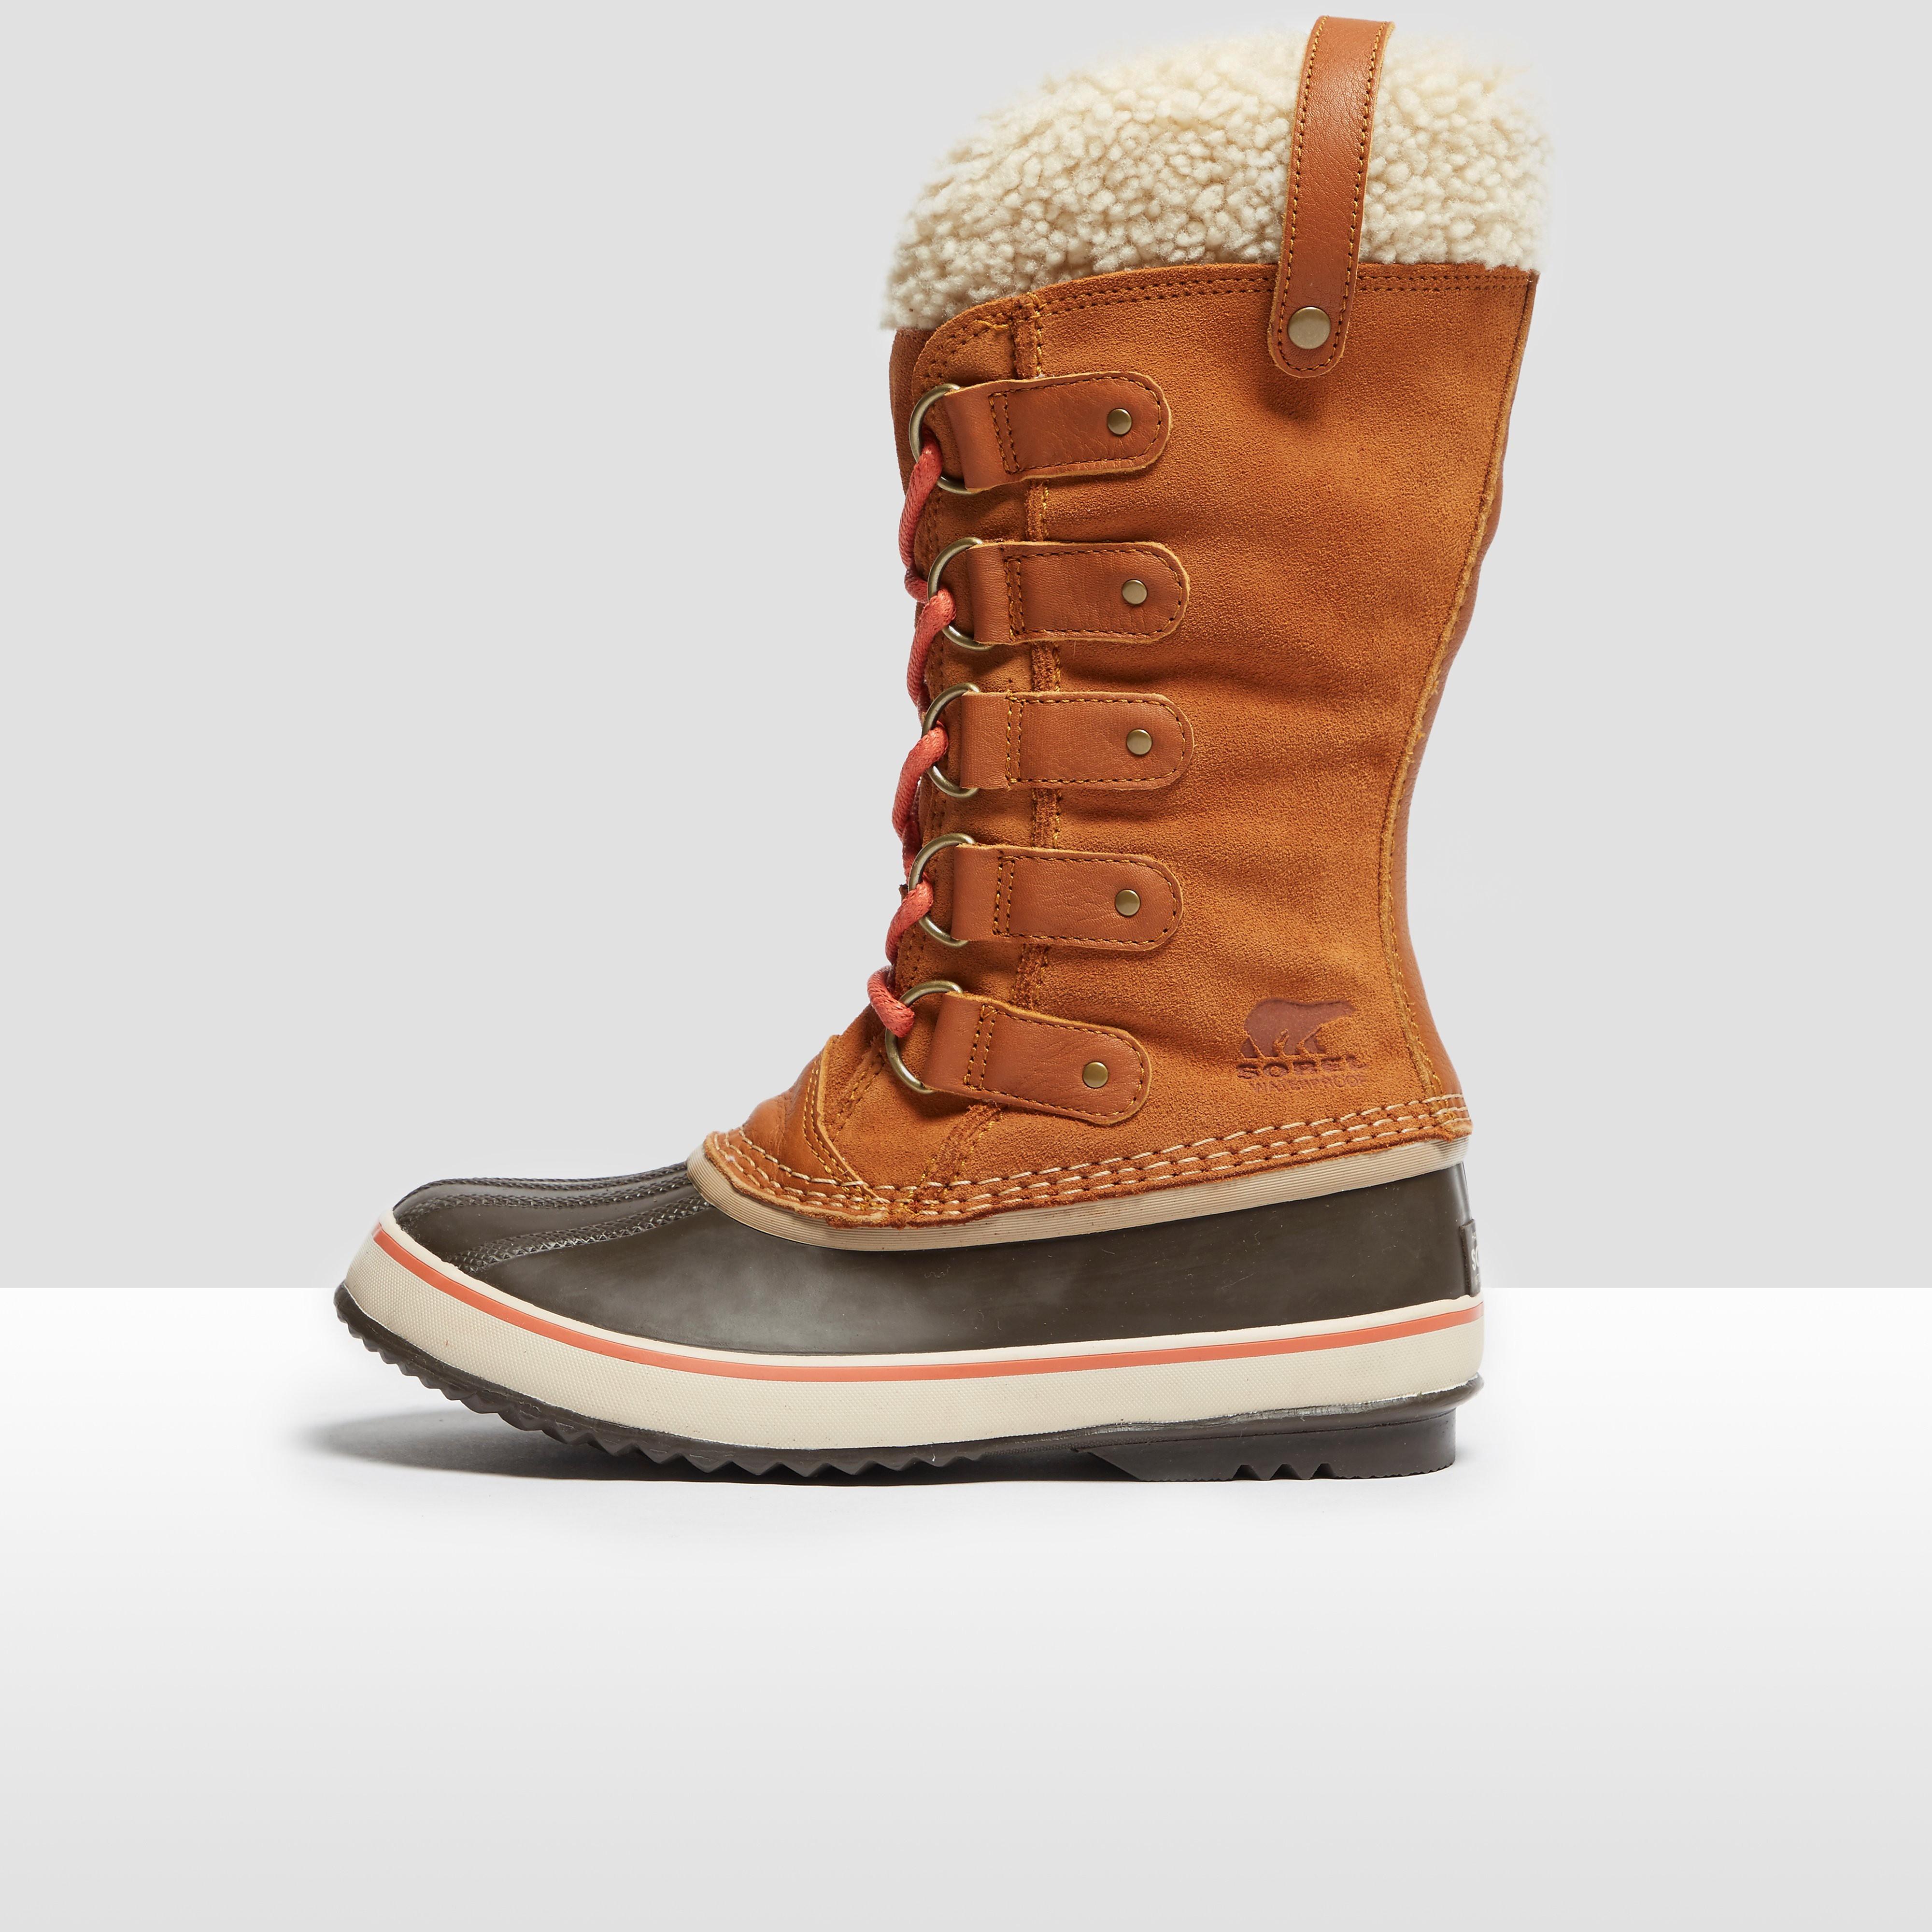 Sorel Joan Of Arctic Women's Shearling Boots